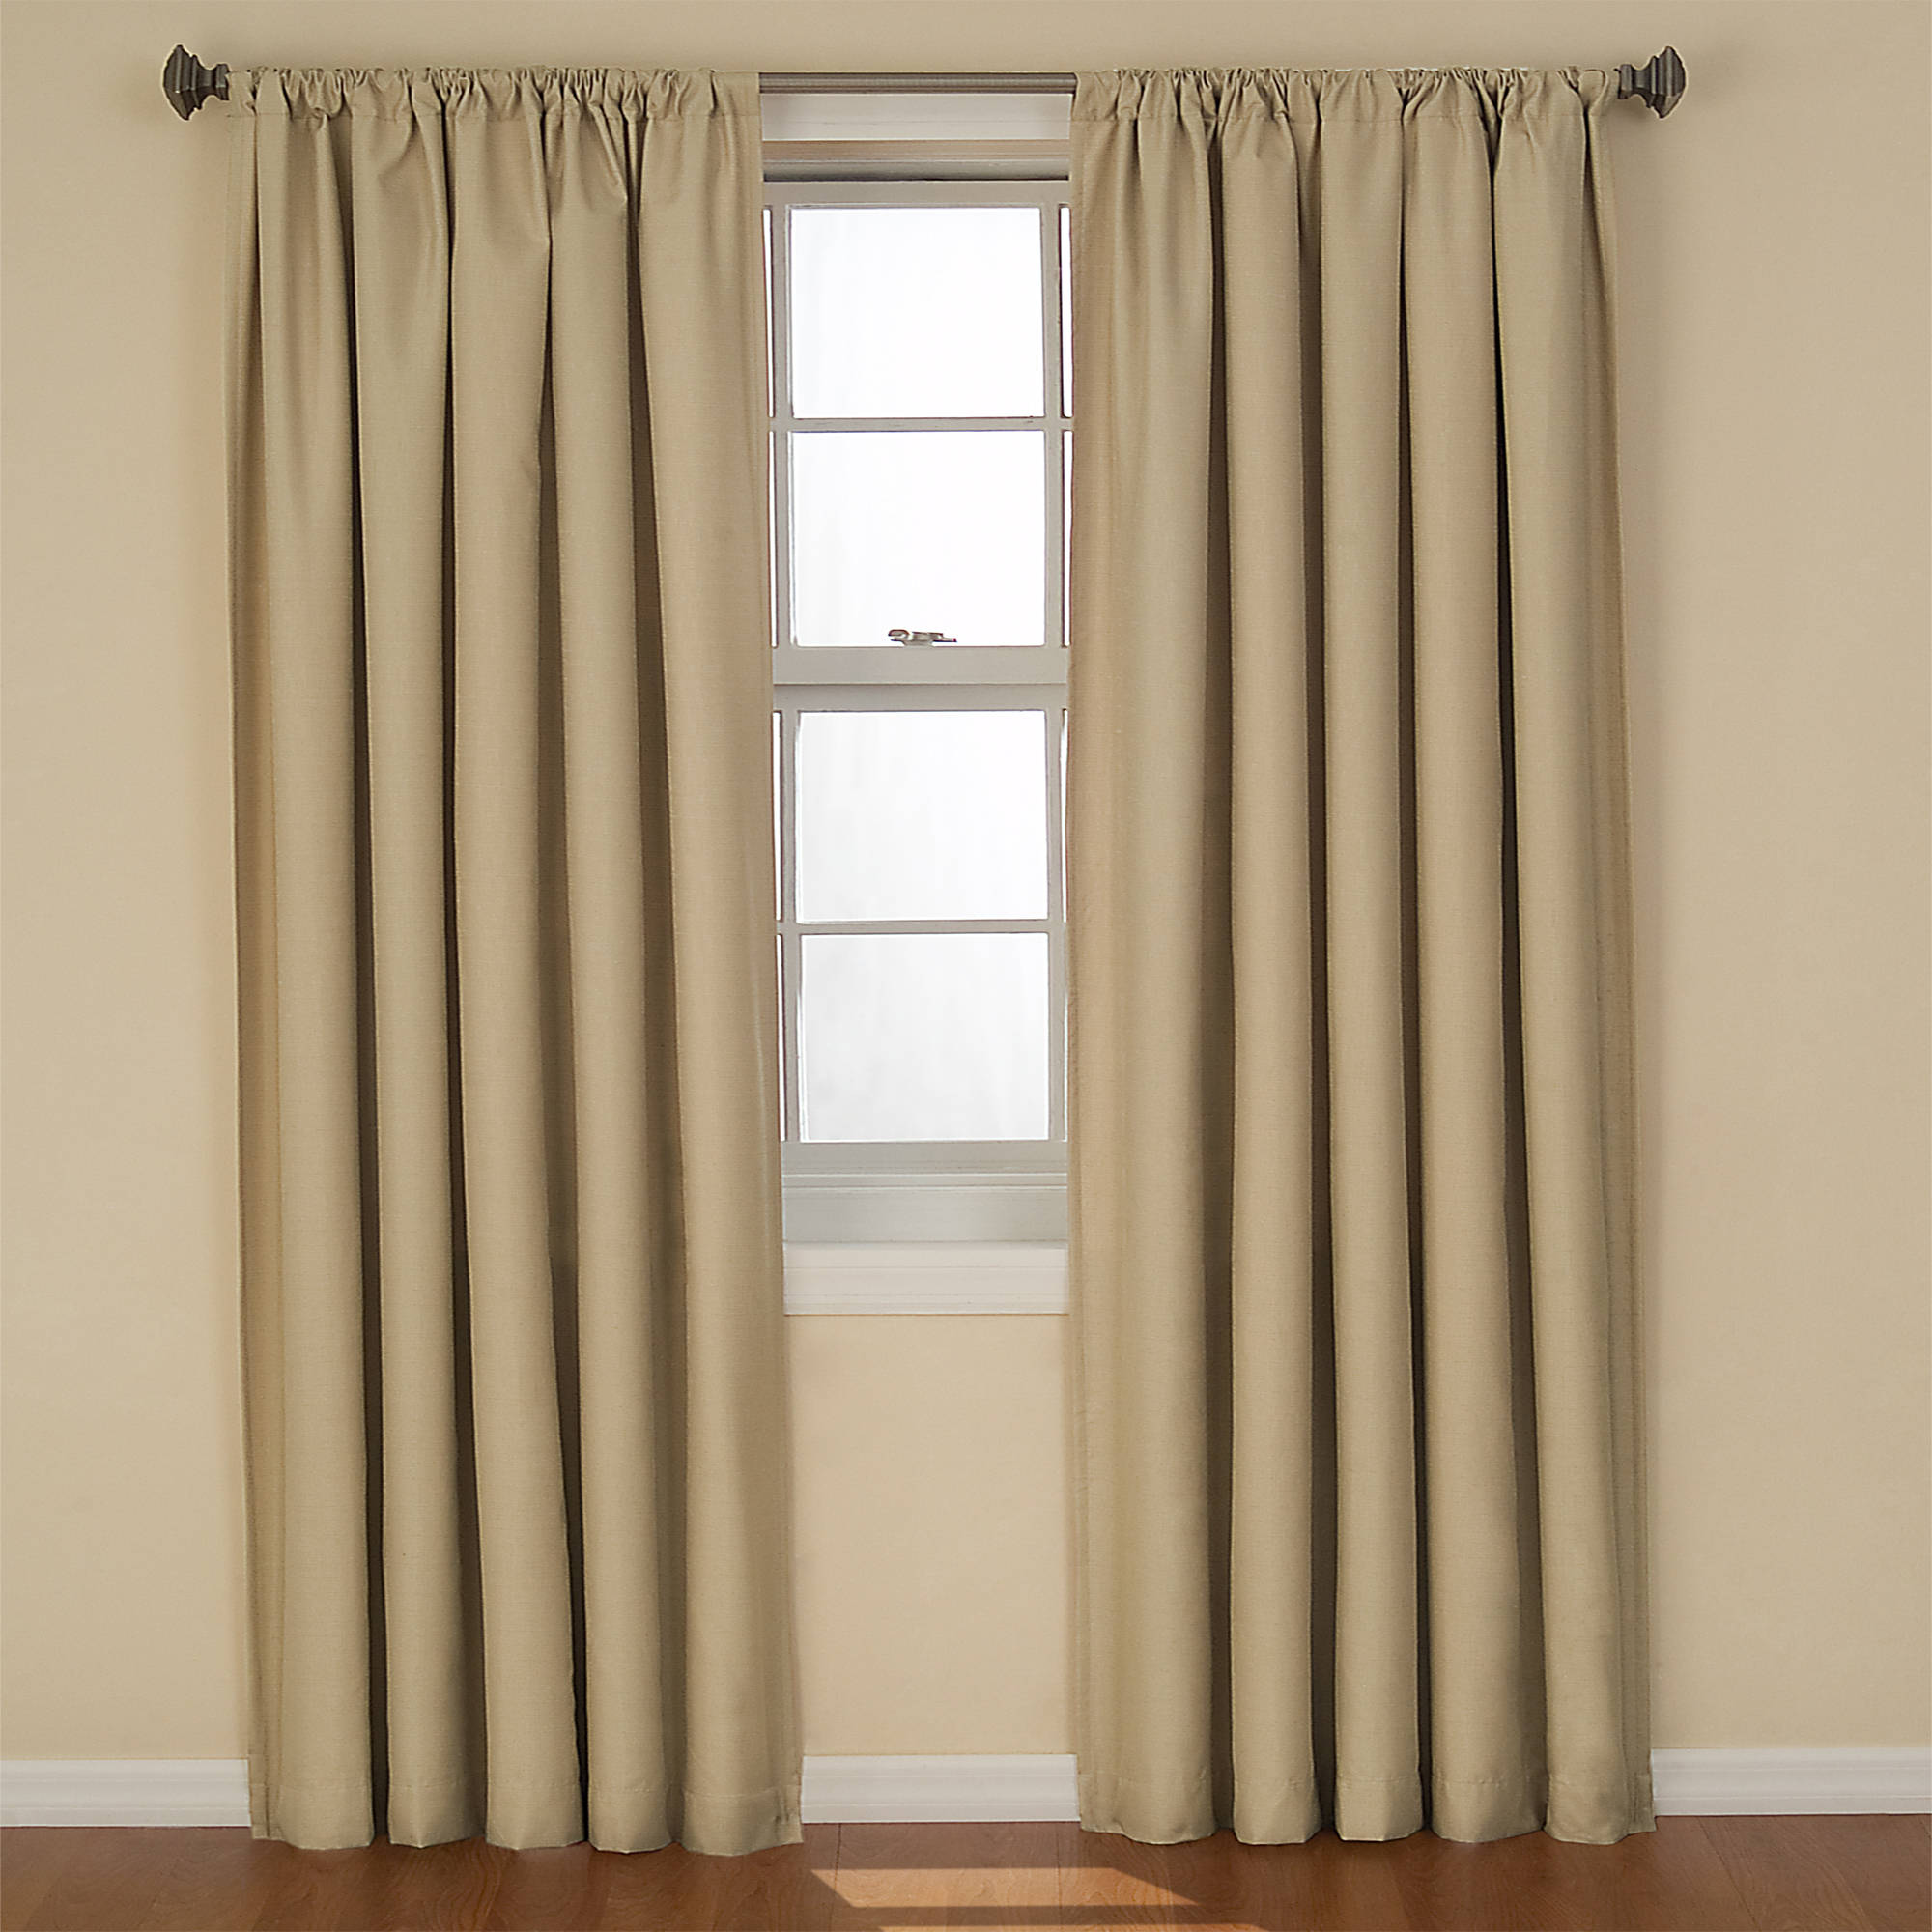 Eclipse Curtains Kendall Blackout Energy-Efficient Curtain Panel